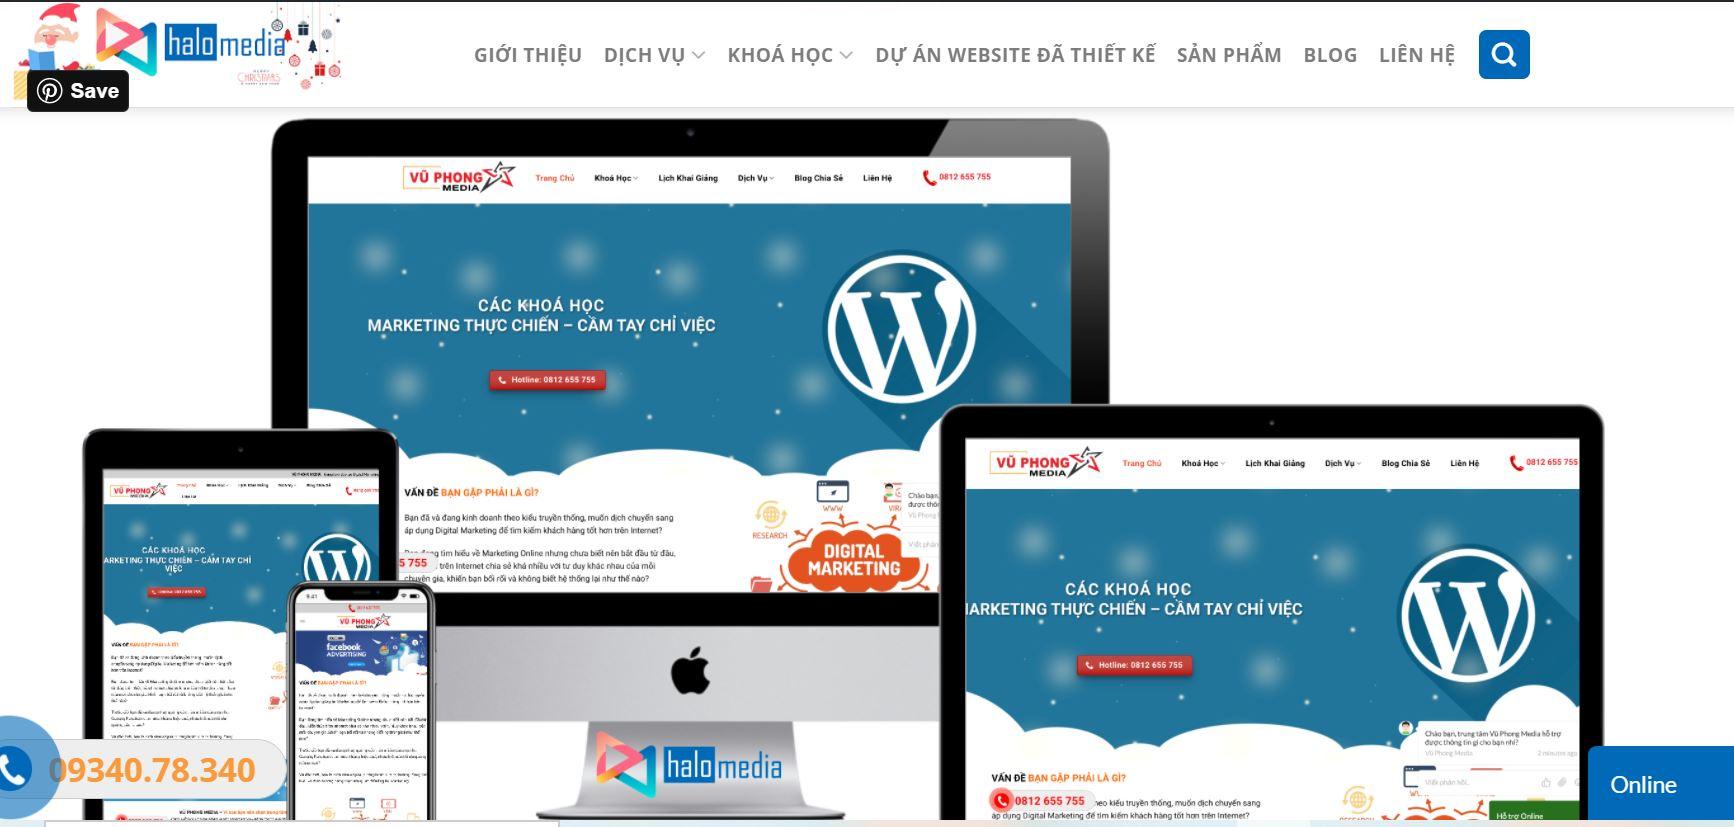 website e-learning do halo media thiết kế